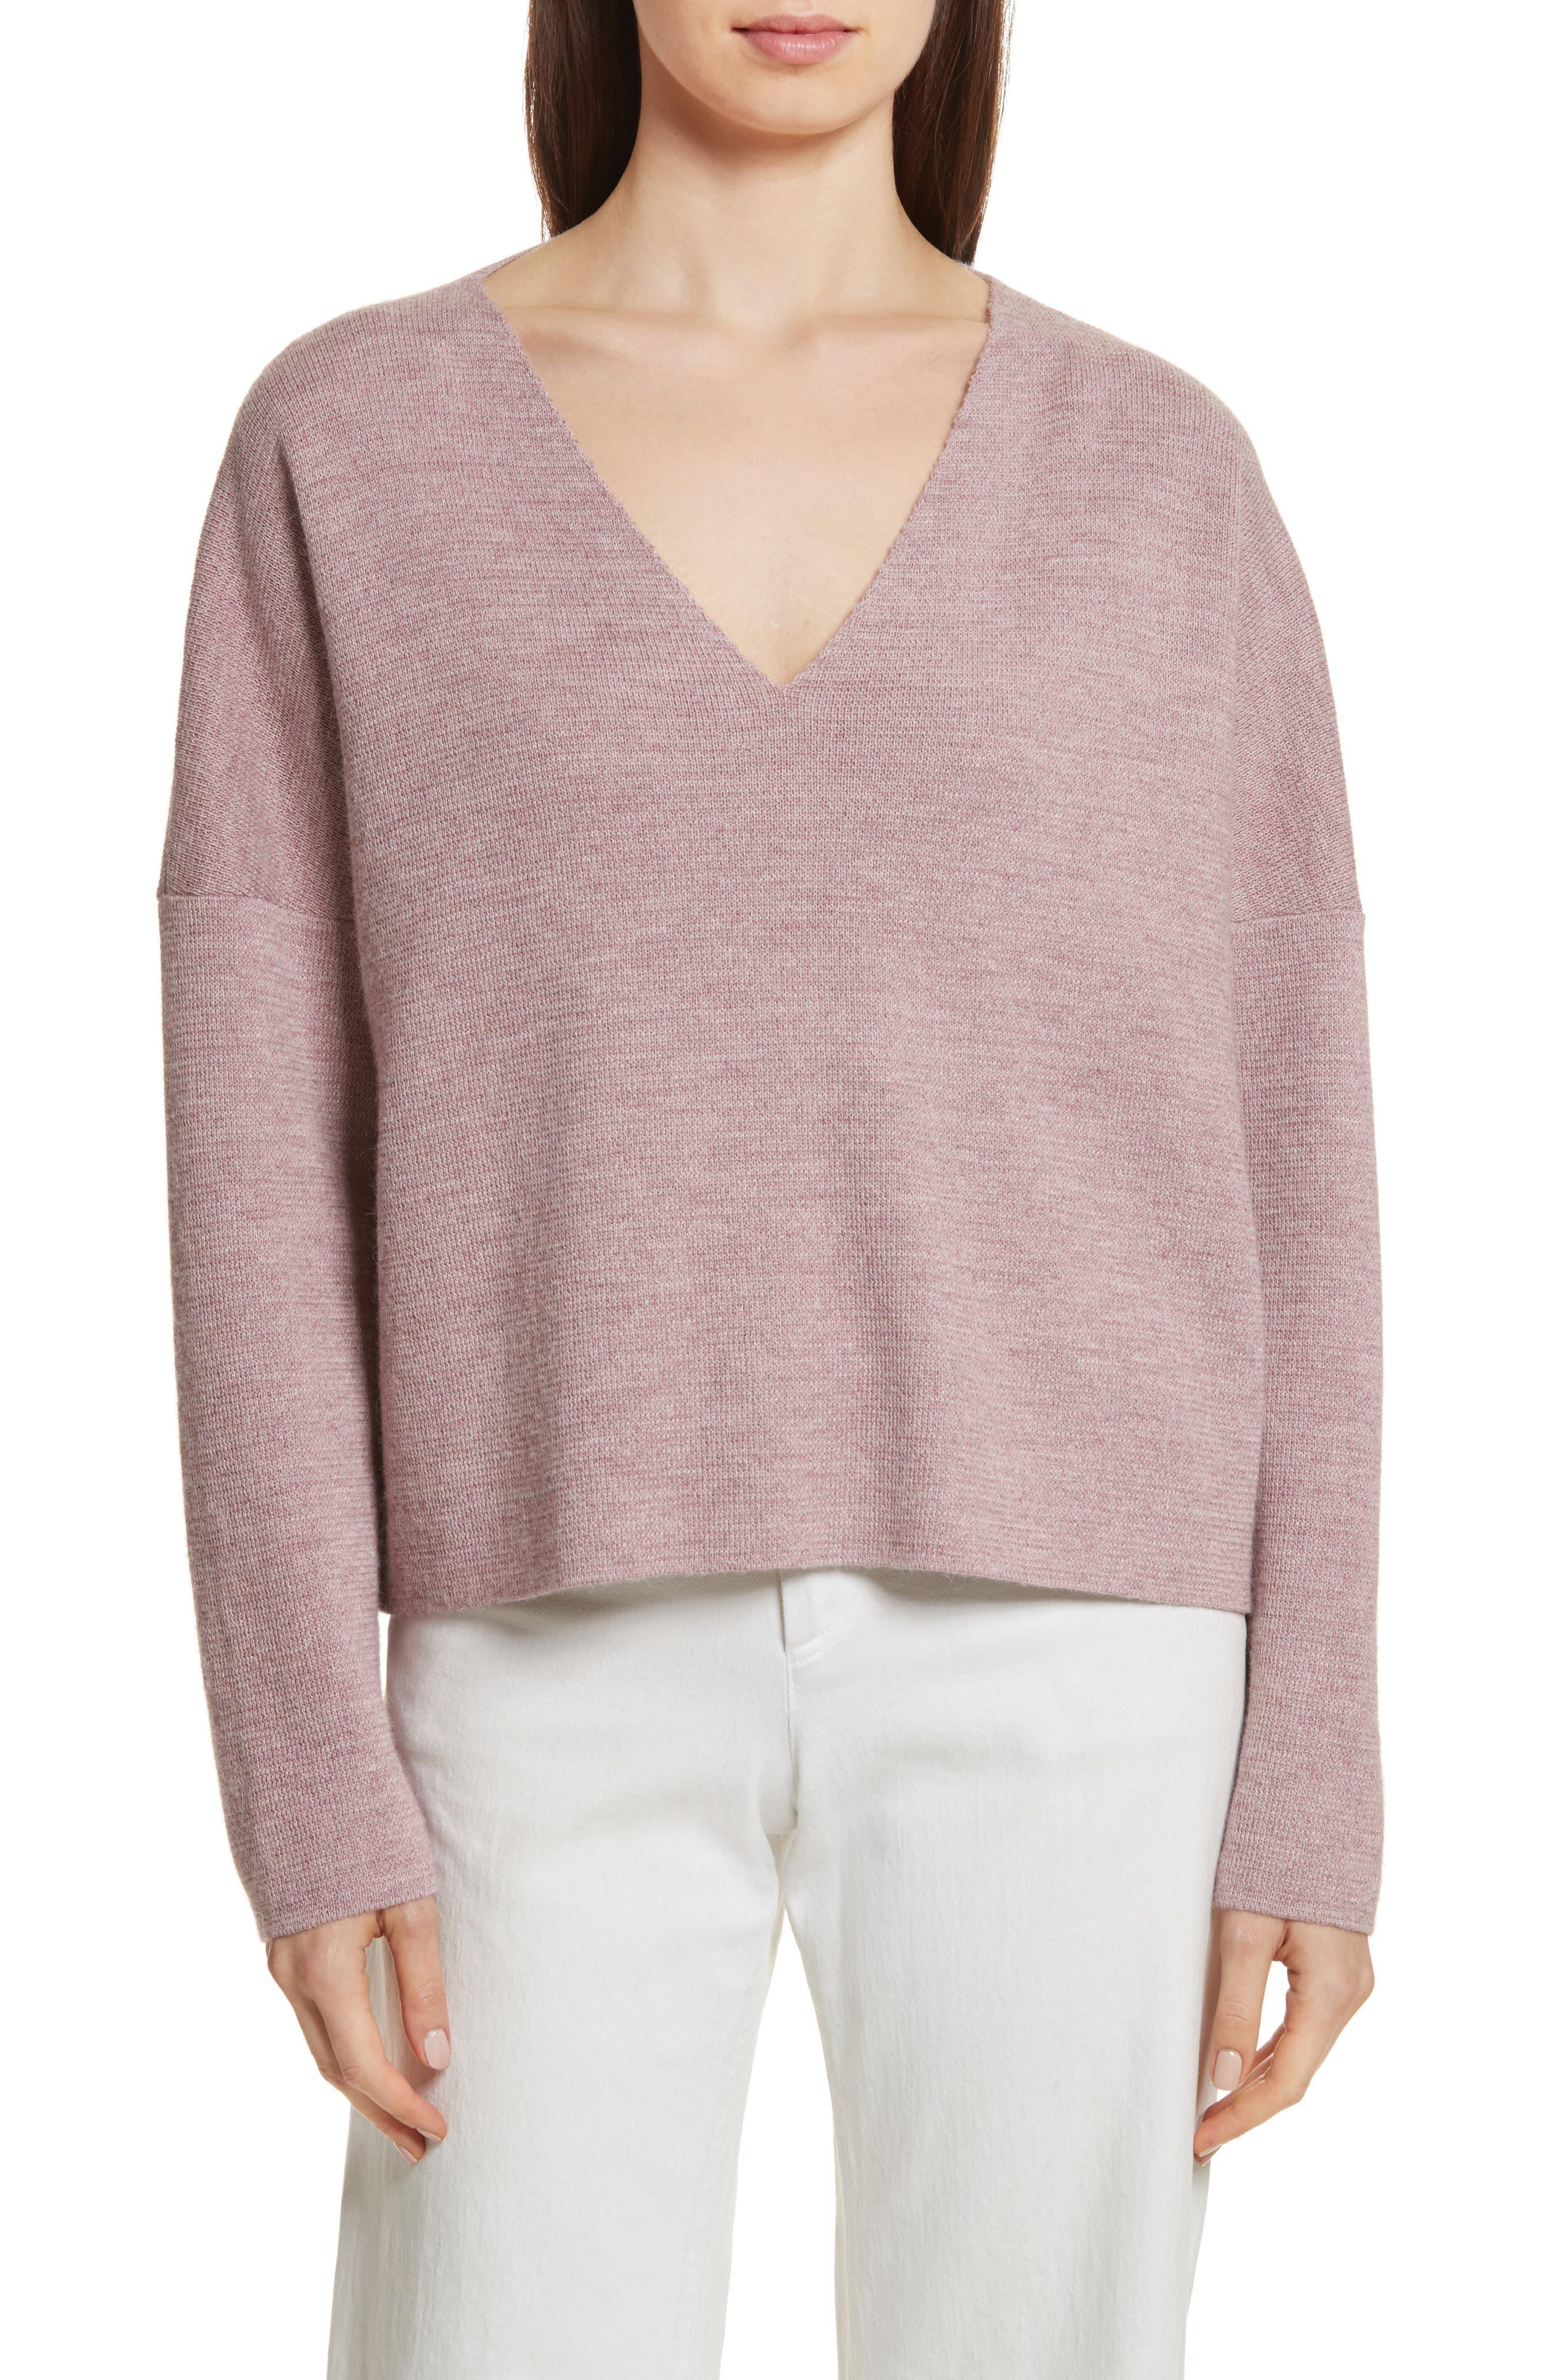 Fount Alpaca Hair Sweater,                             Main thumbnail 1, color,                             Lilac